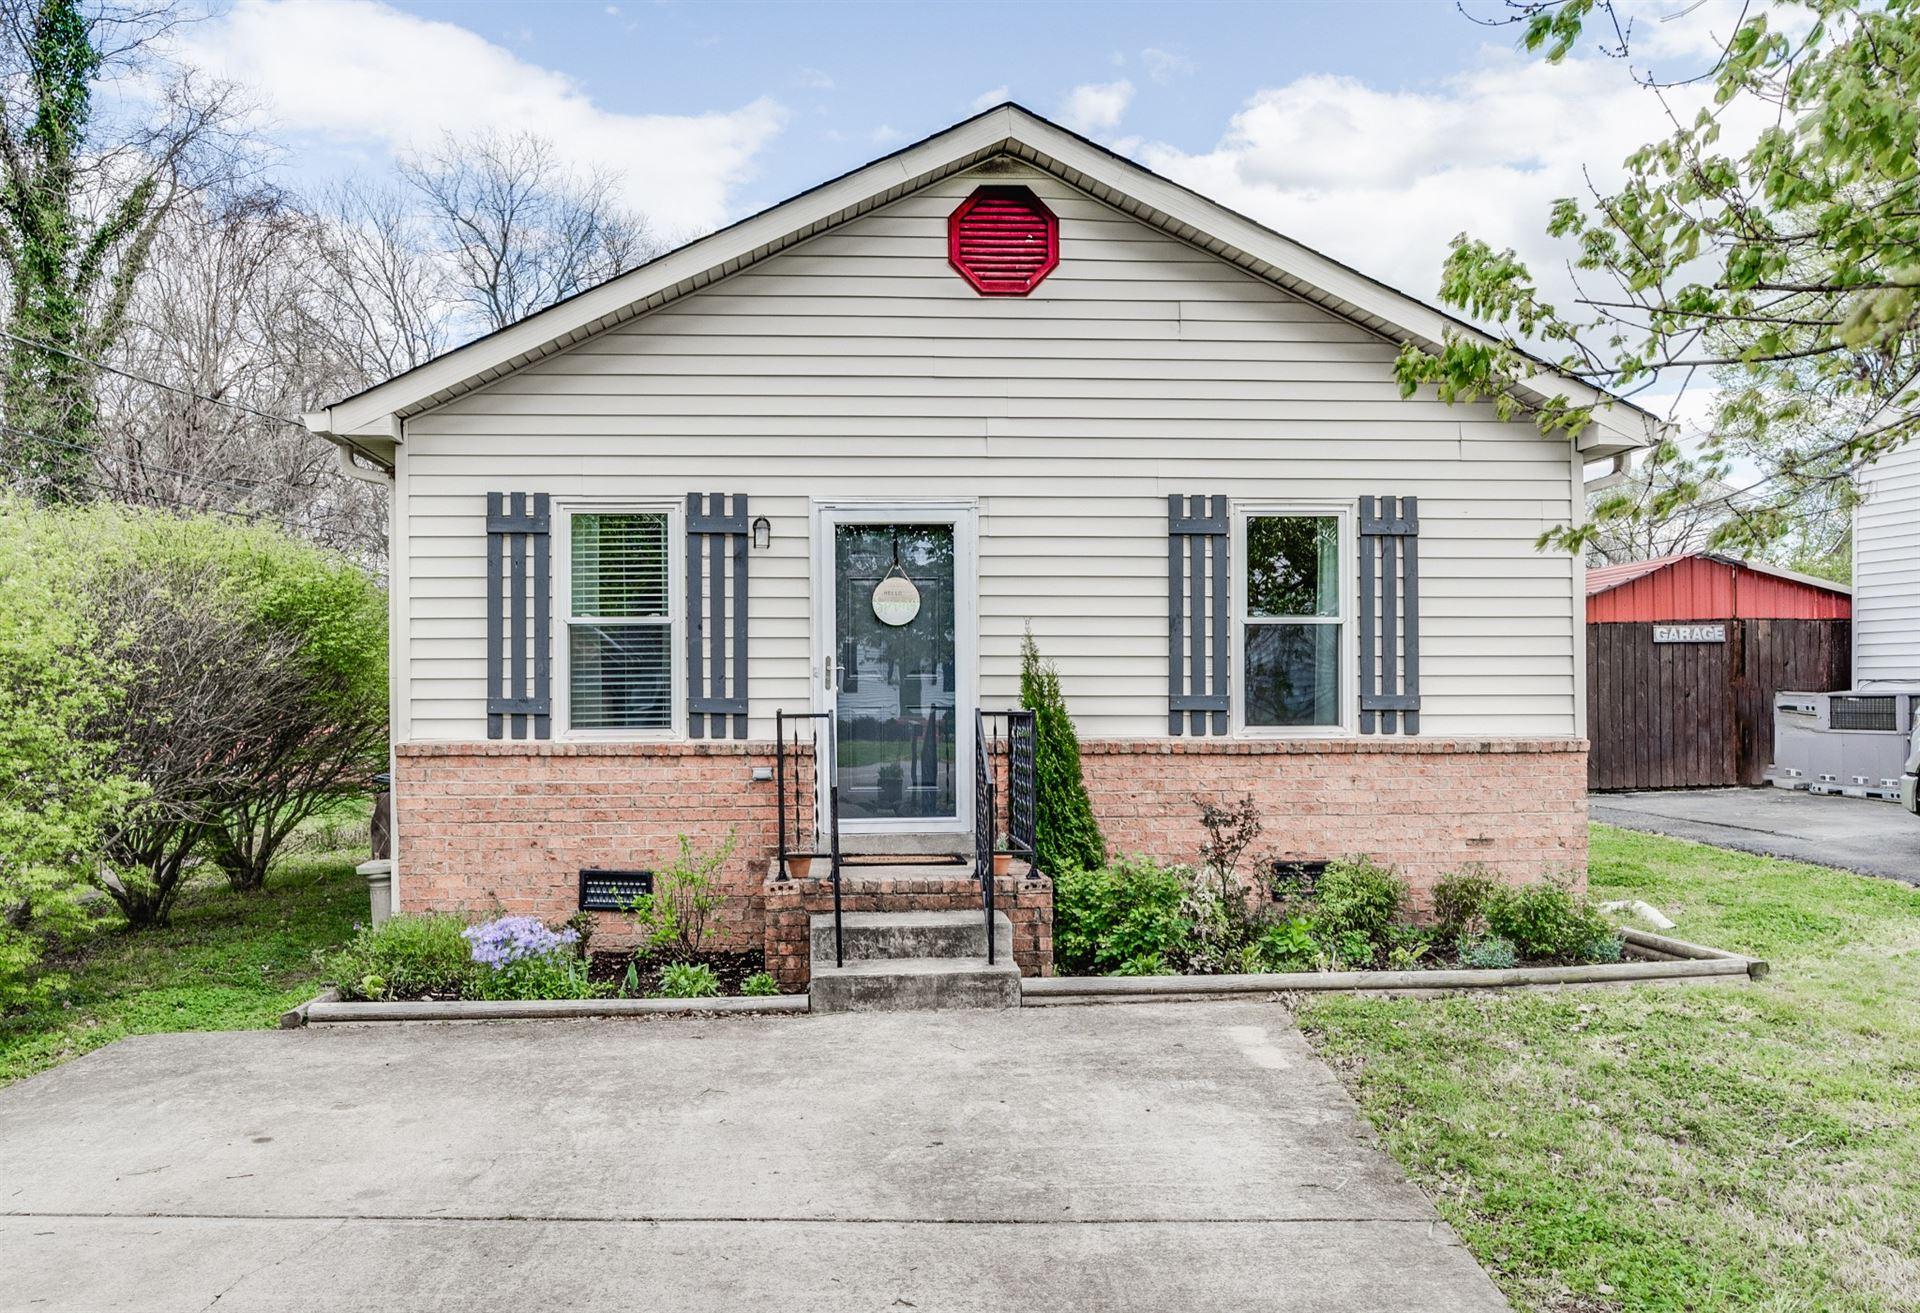 4612 Grinstead Pl, Nashville, TN 37216 - MLS#: 2242223